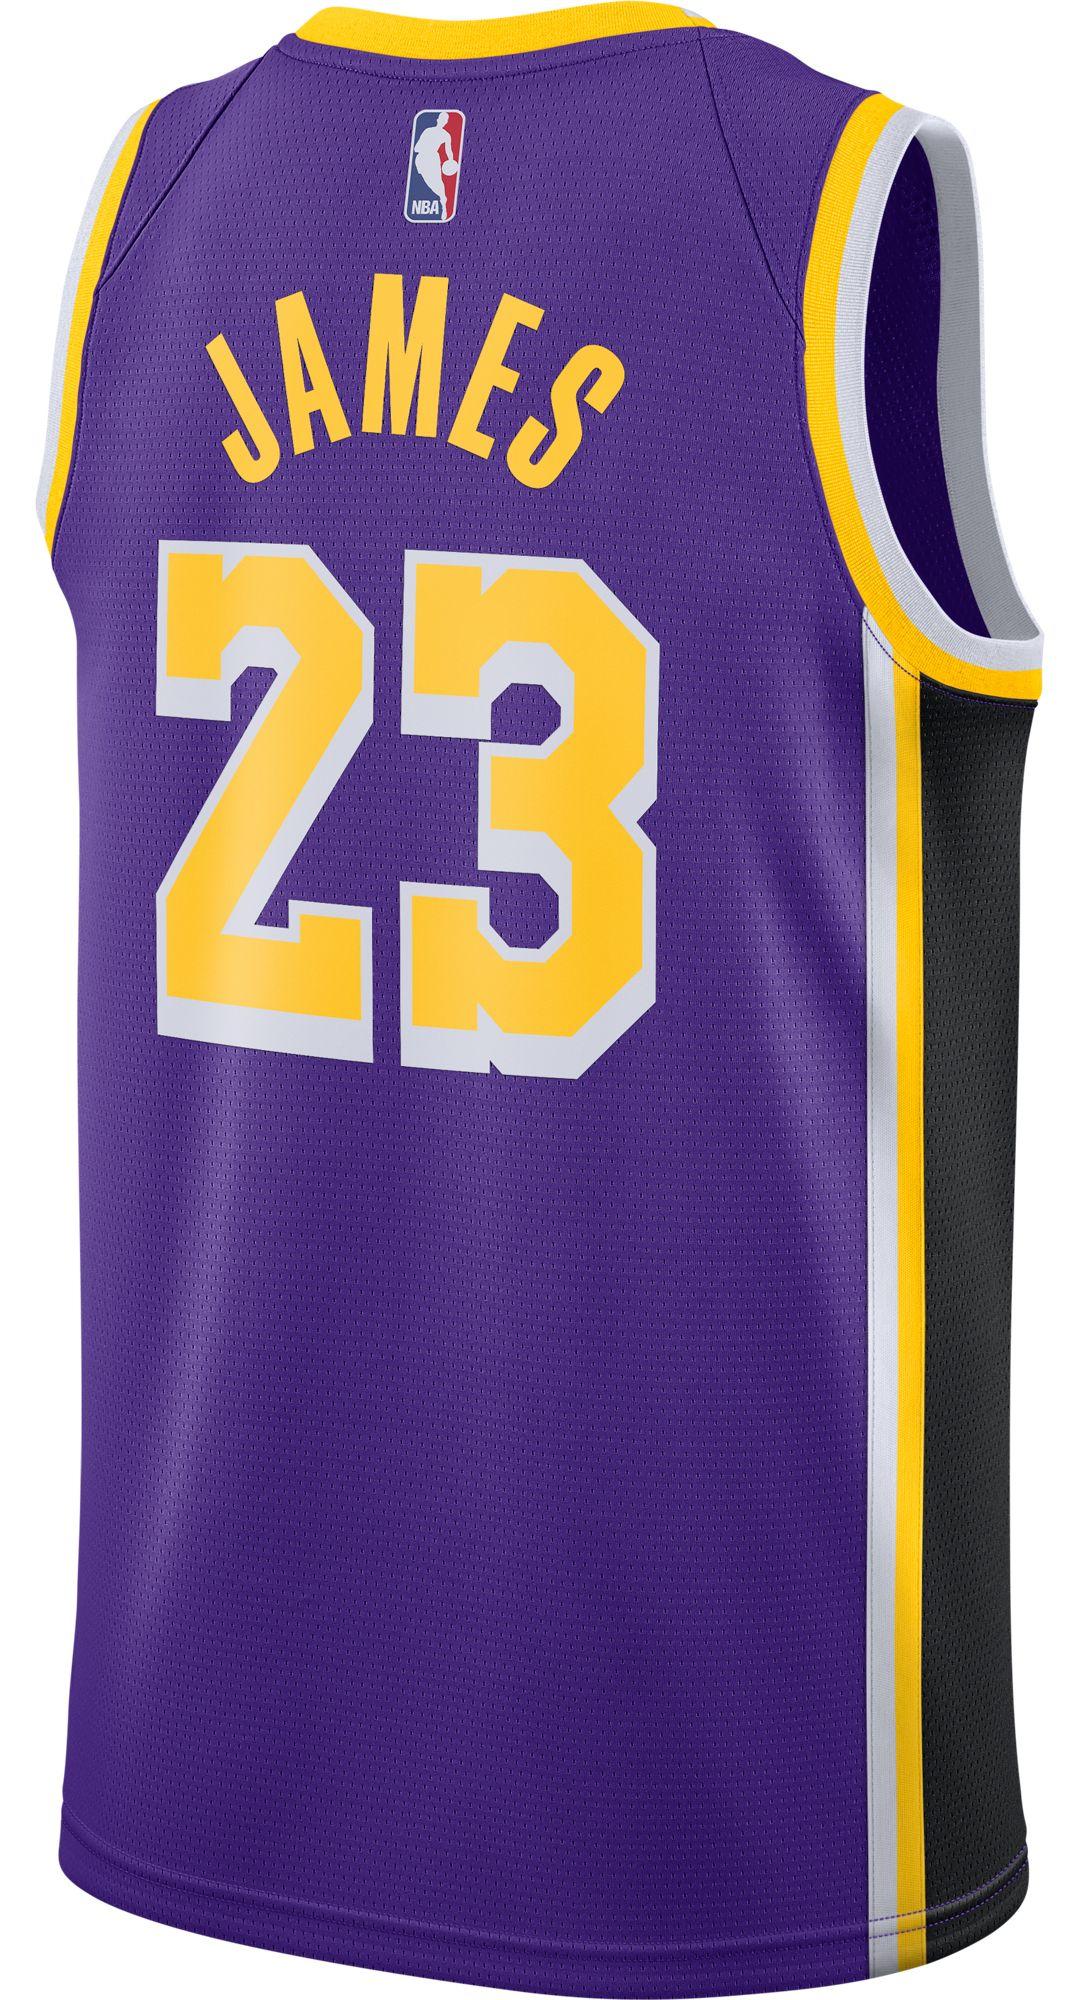 reputable site 1dbeb b11b3 Nike Men's Los Angeles Lakers LeBron James #23 Purple Dri-FIT Swingman  Jersey